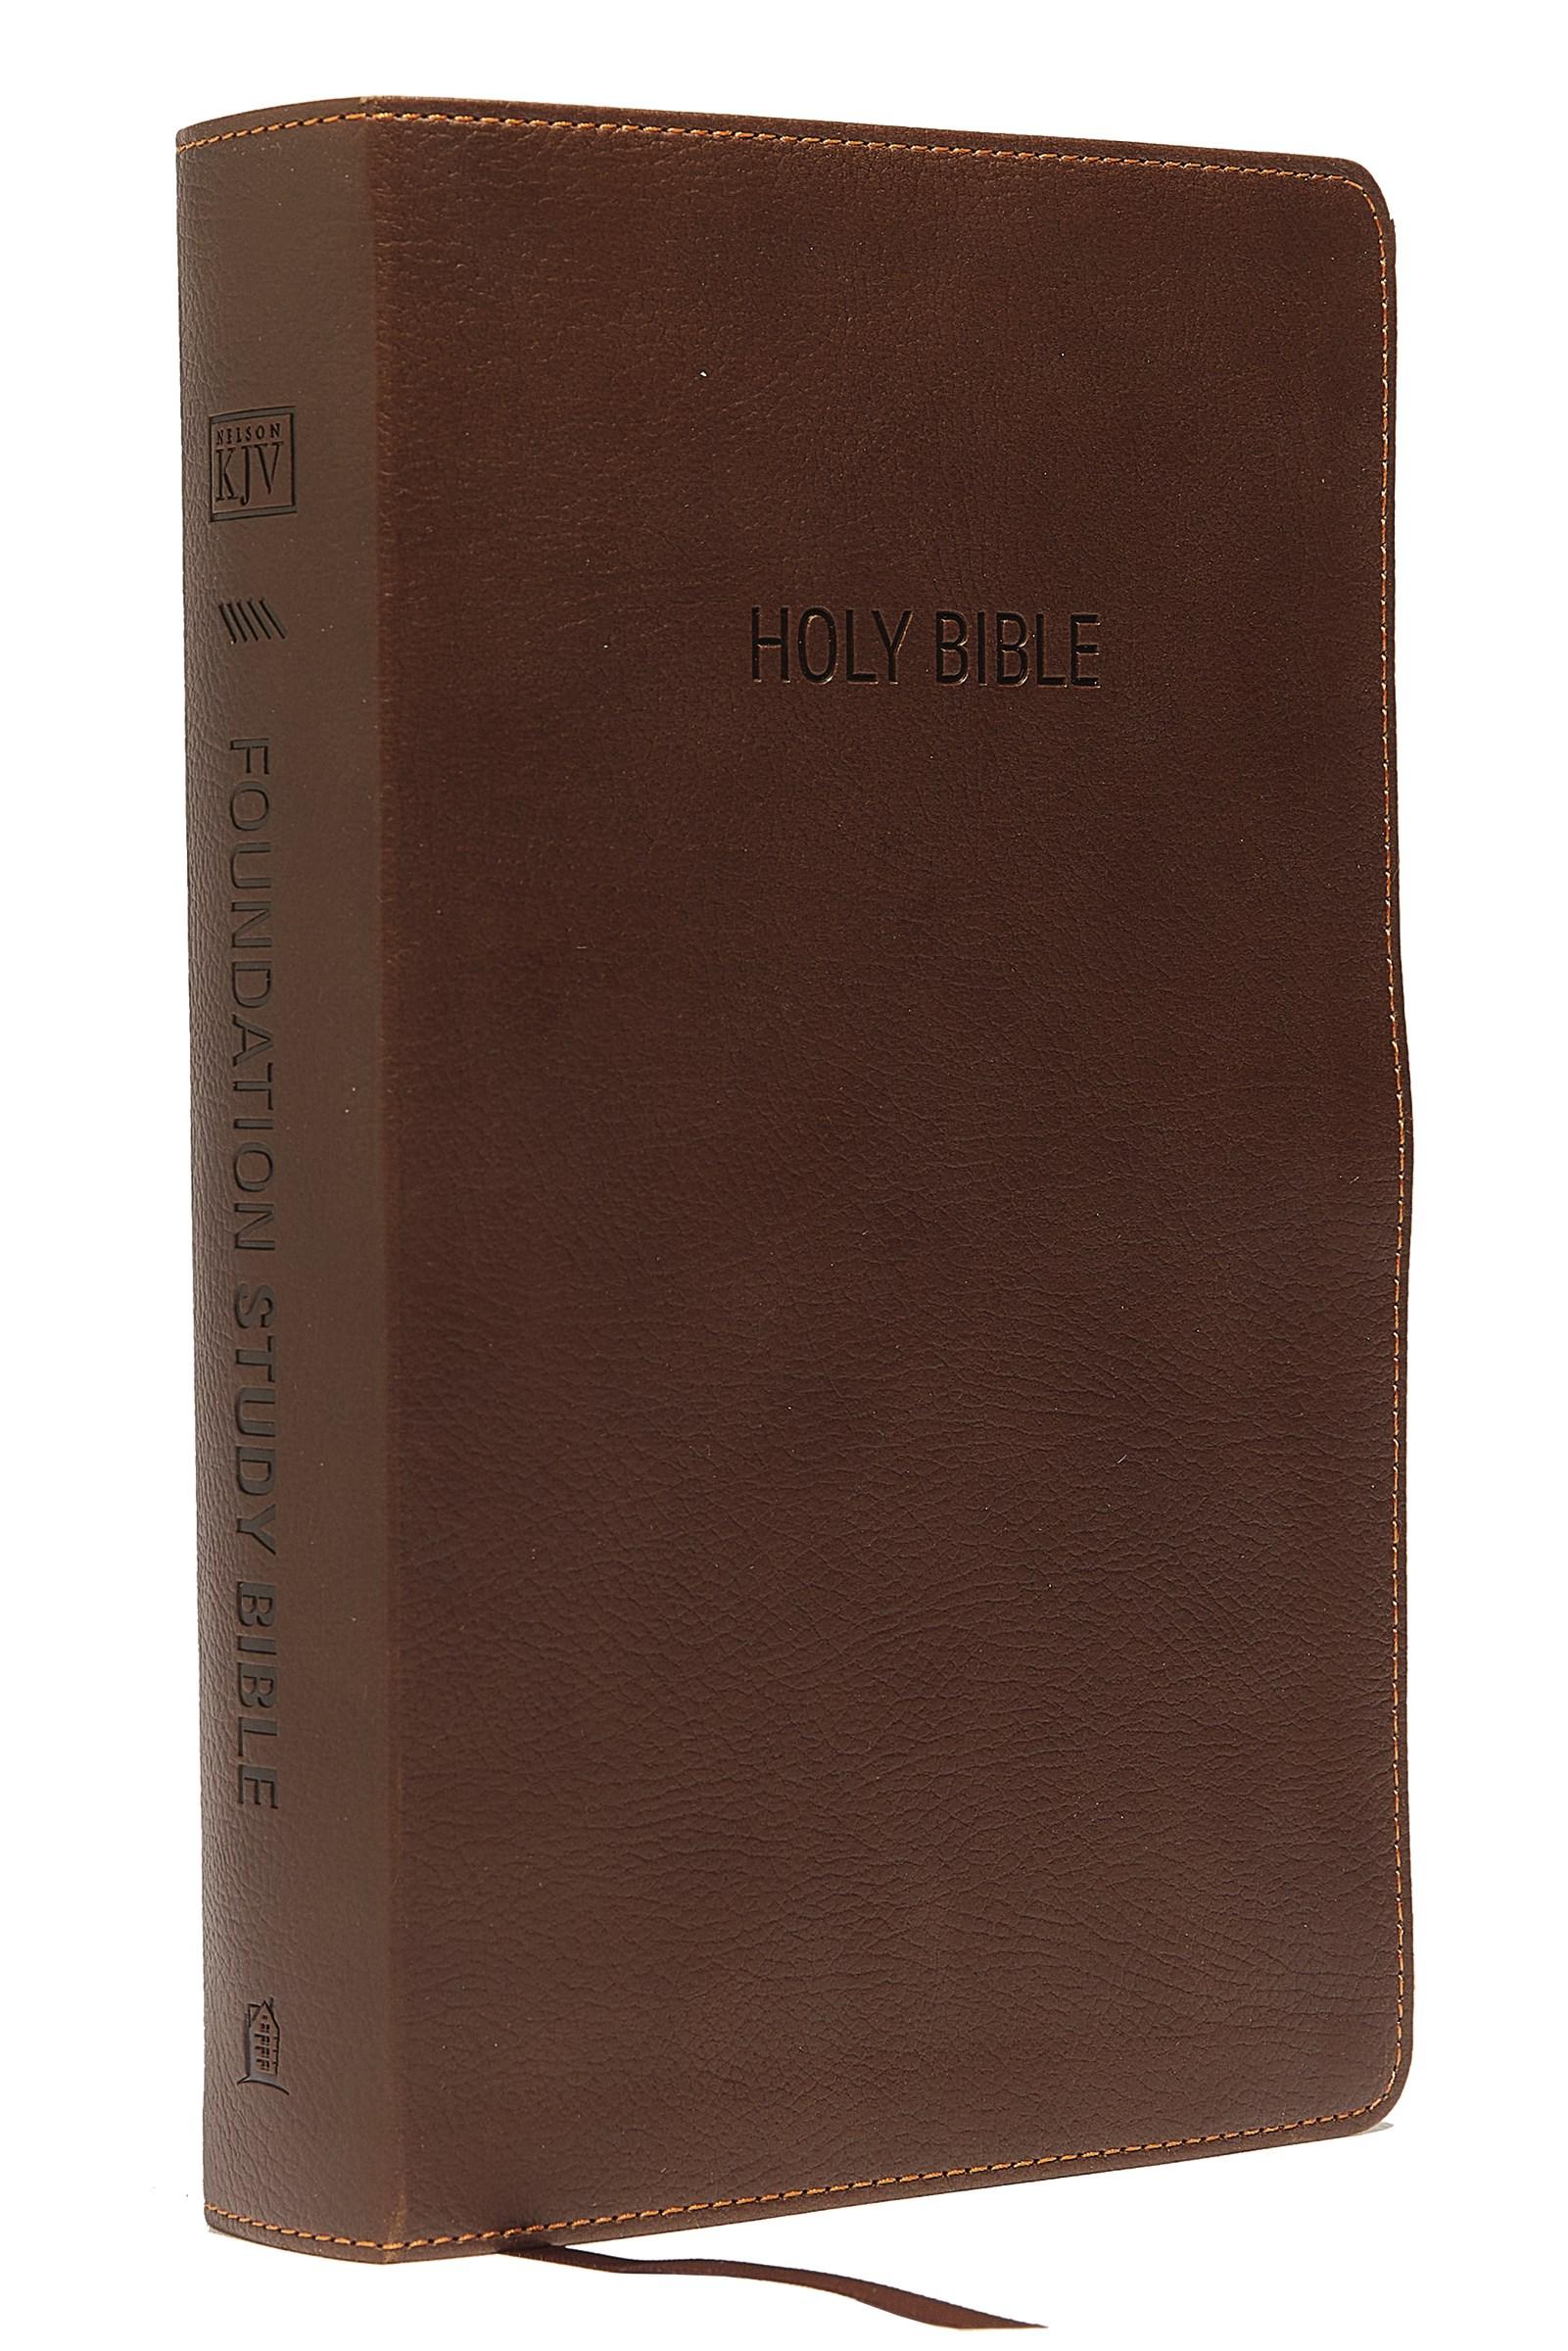 KJV Foundation Study Bible-Earth Brown LeatherSoft